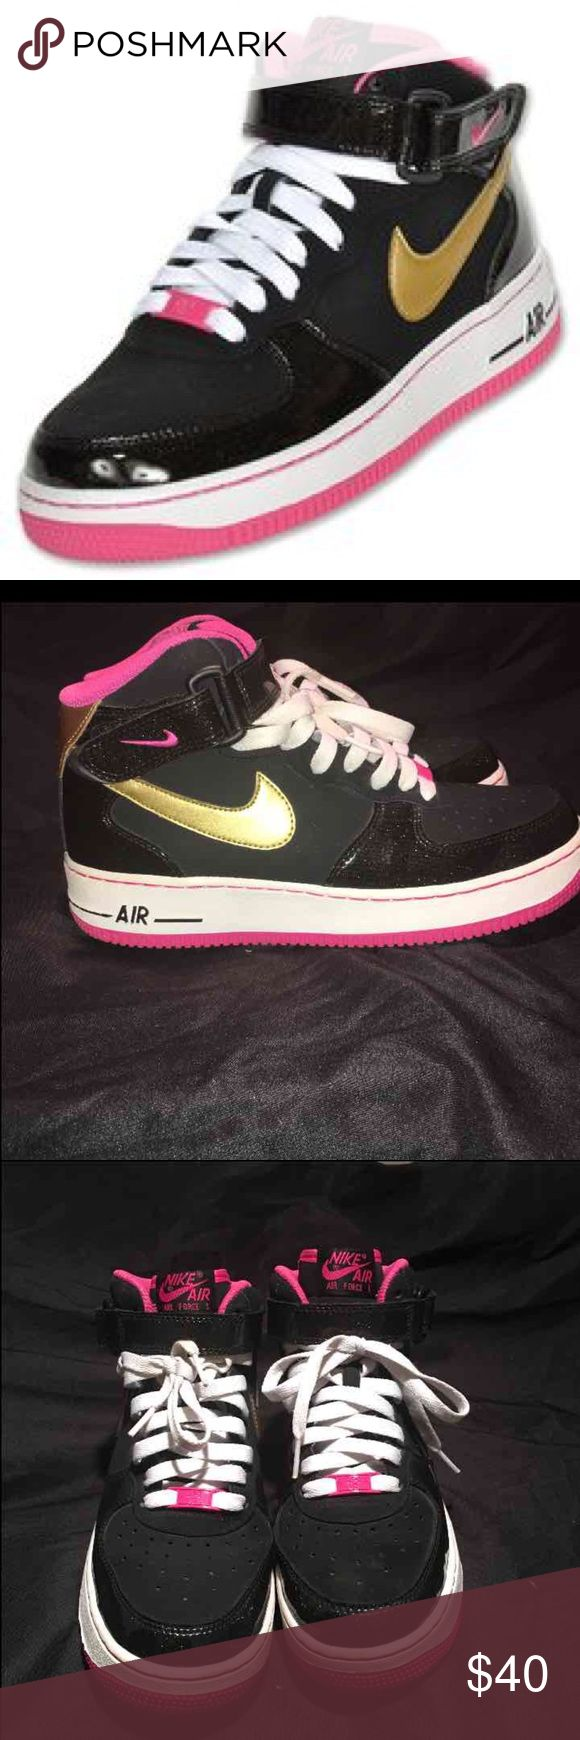 8f2cd743b63b Nike Sweet Classic Youth Review